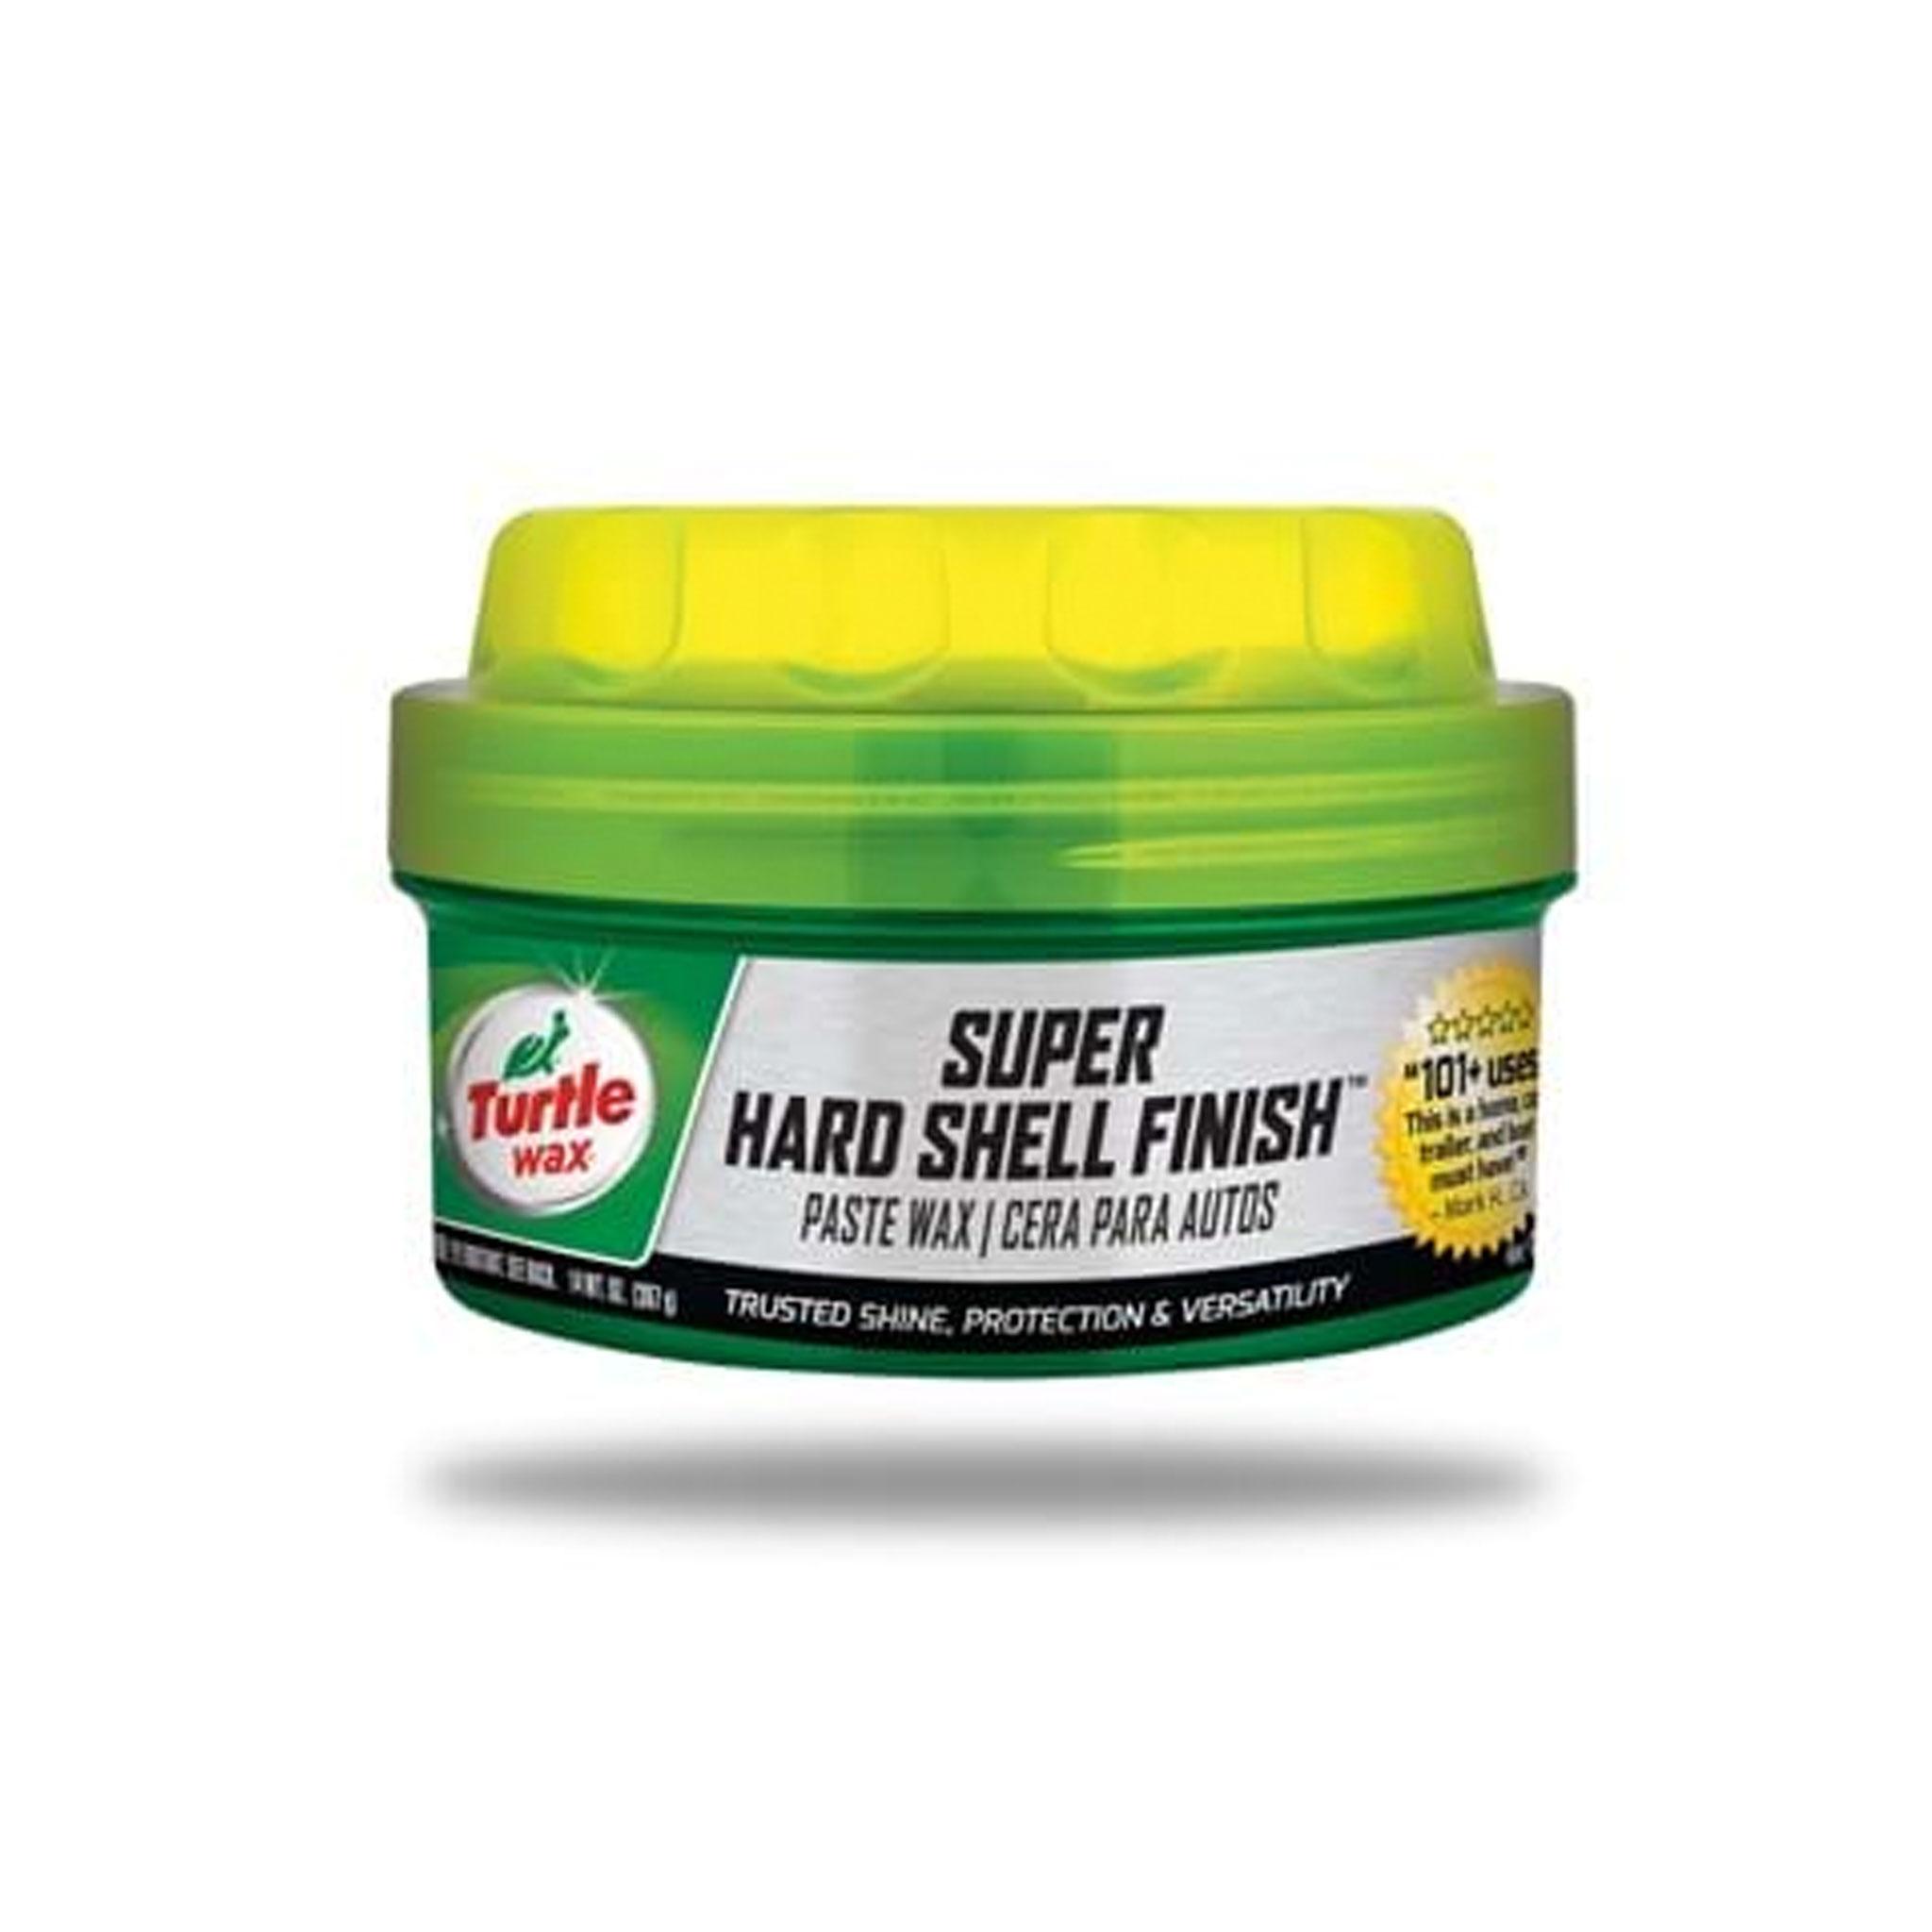 Bilvax Turtle Wax Super Hard Shell Paste Wax, 397 g